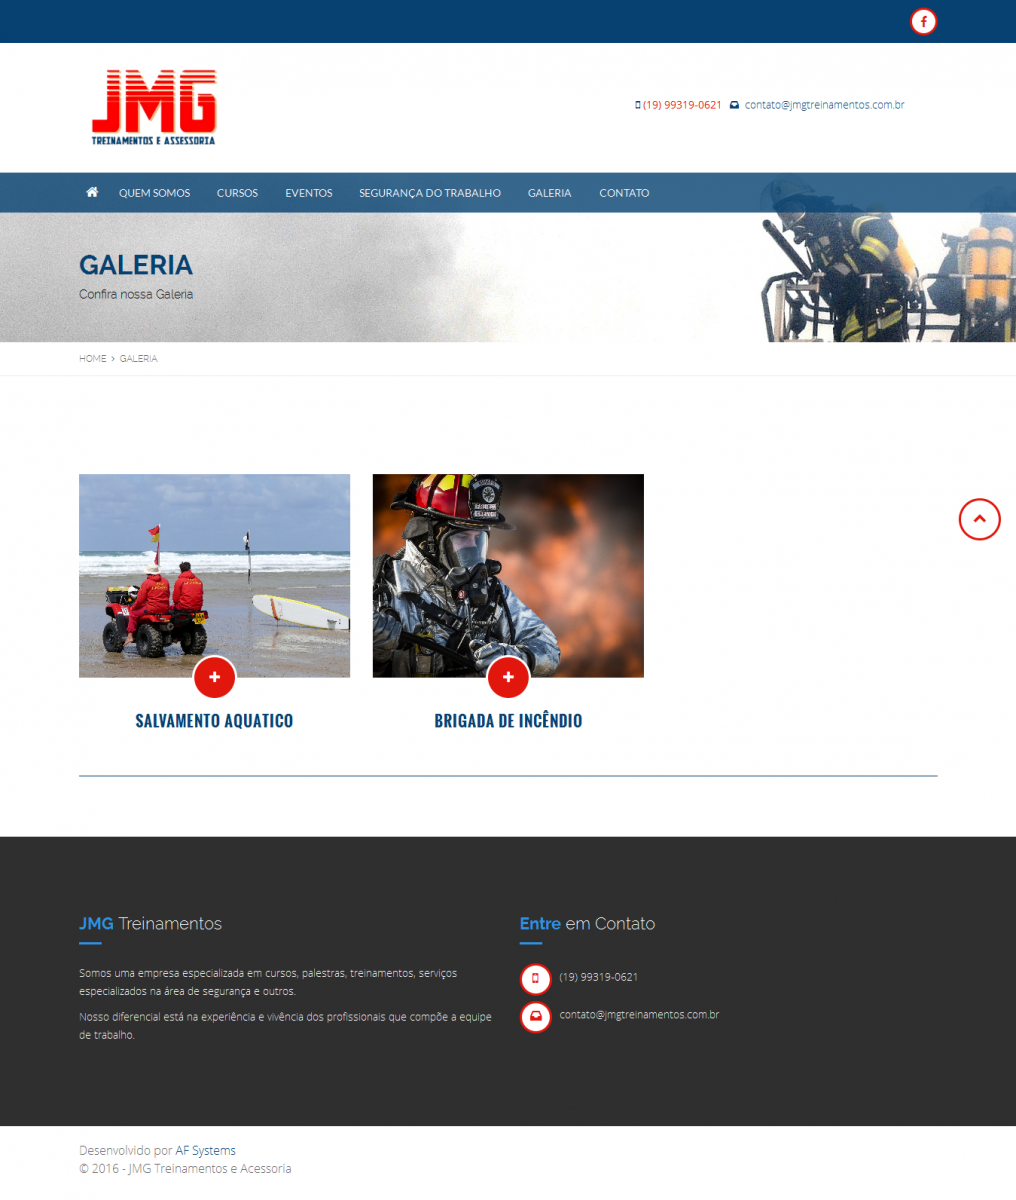 JMG Treinamentos - 2016-11-21 14.19.46